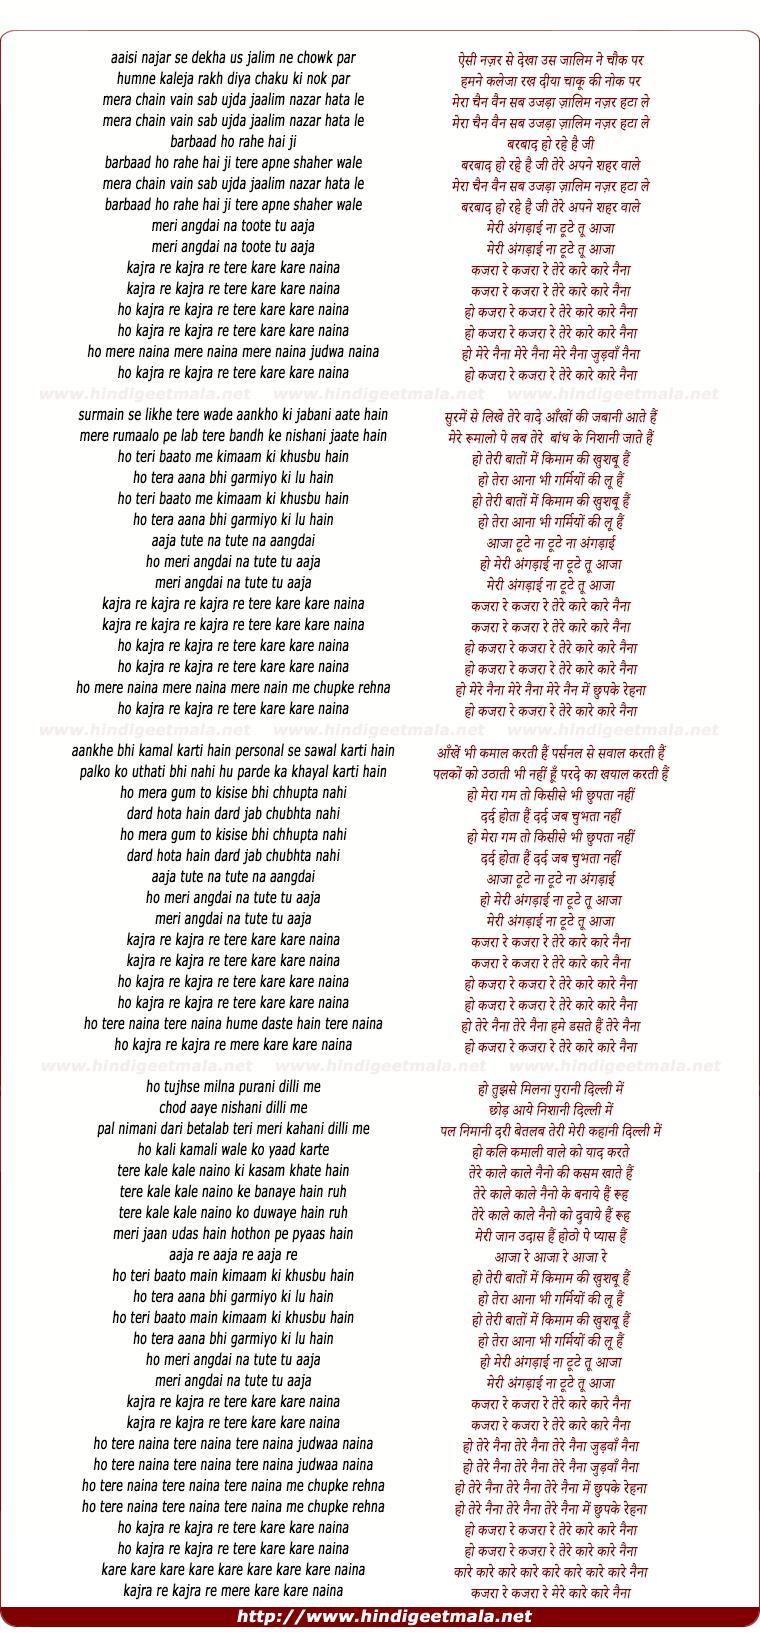 lyrics of song Kajrare Kajrare